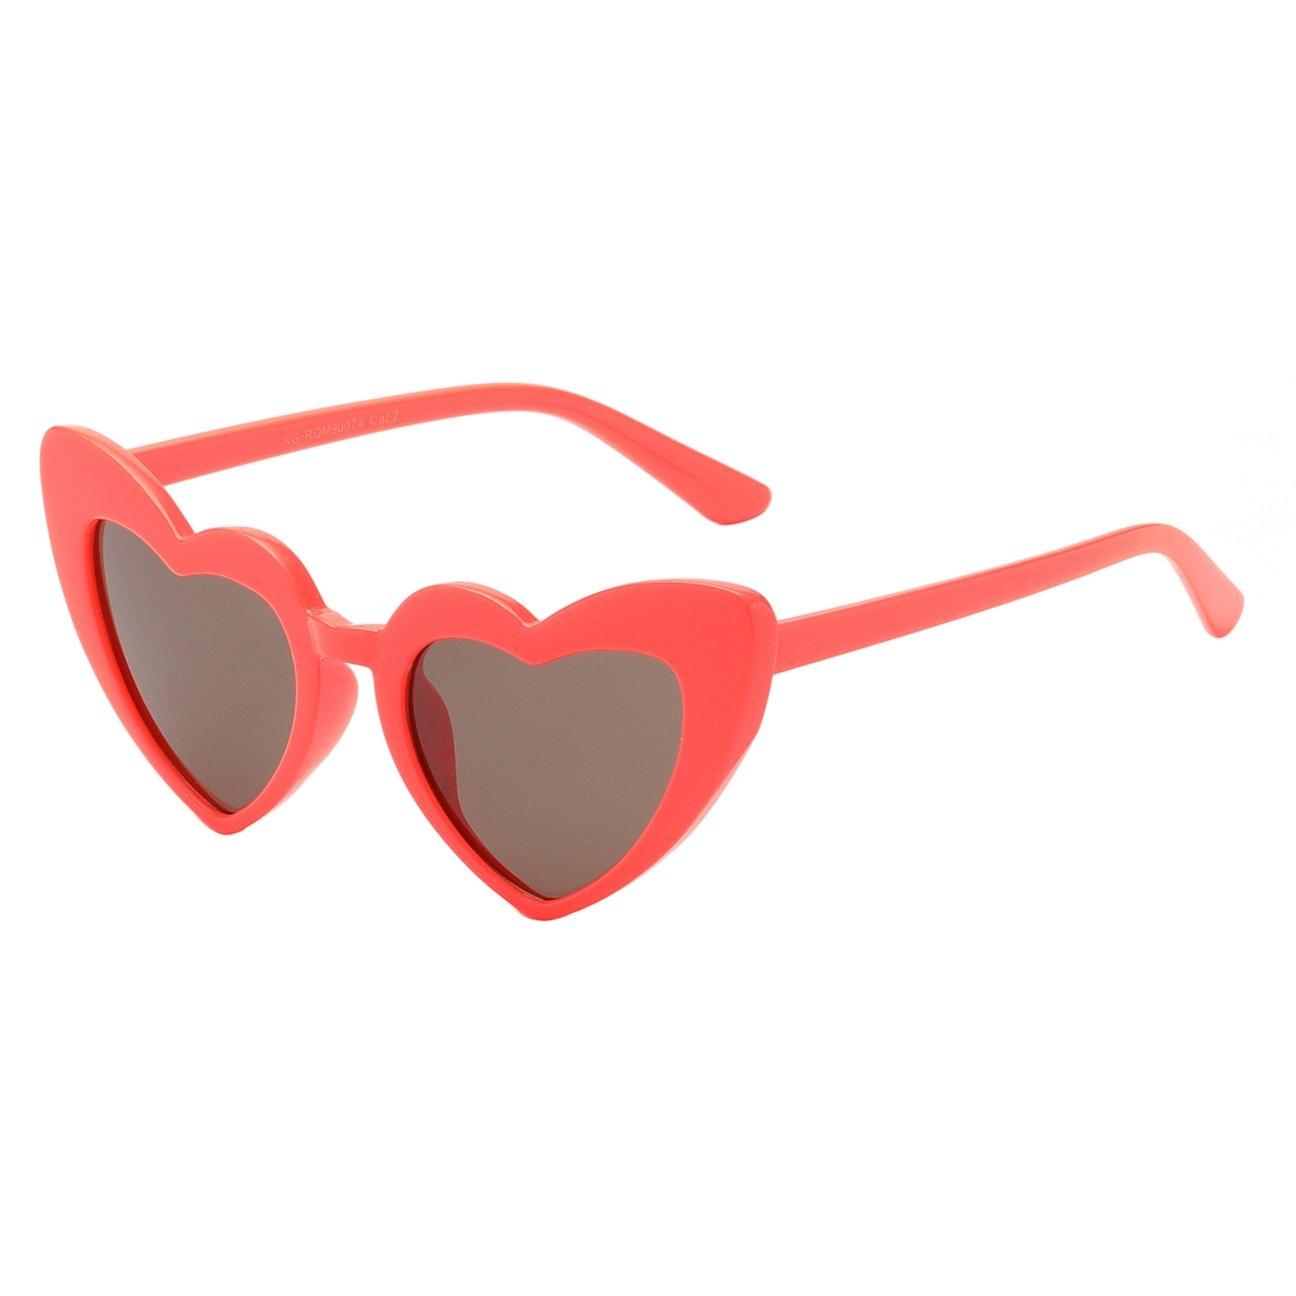 Heartbeaker Sunnies by Luna Sunglasses